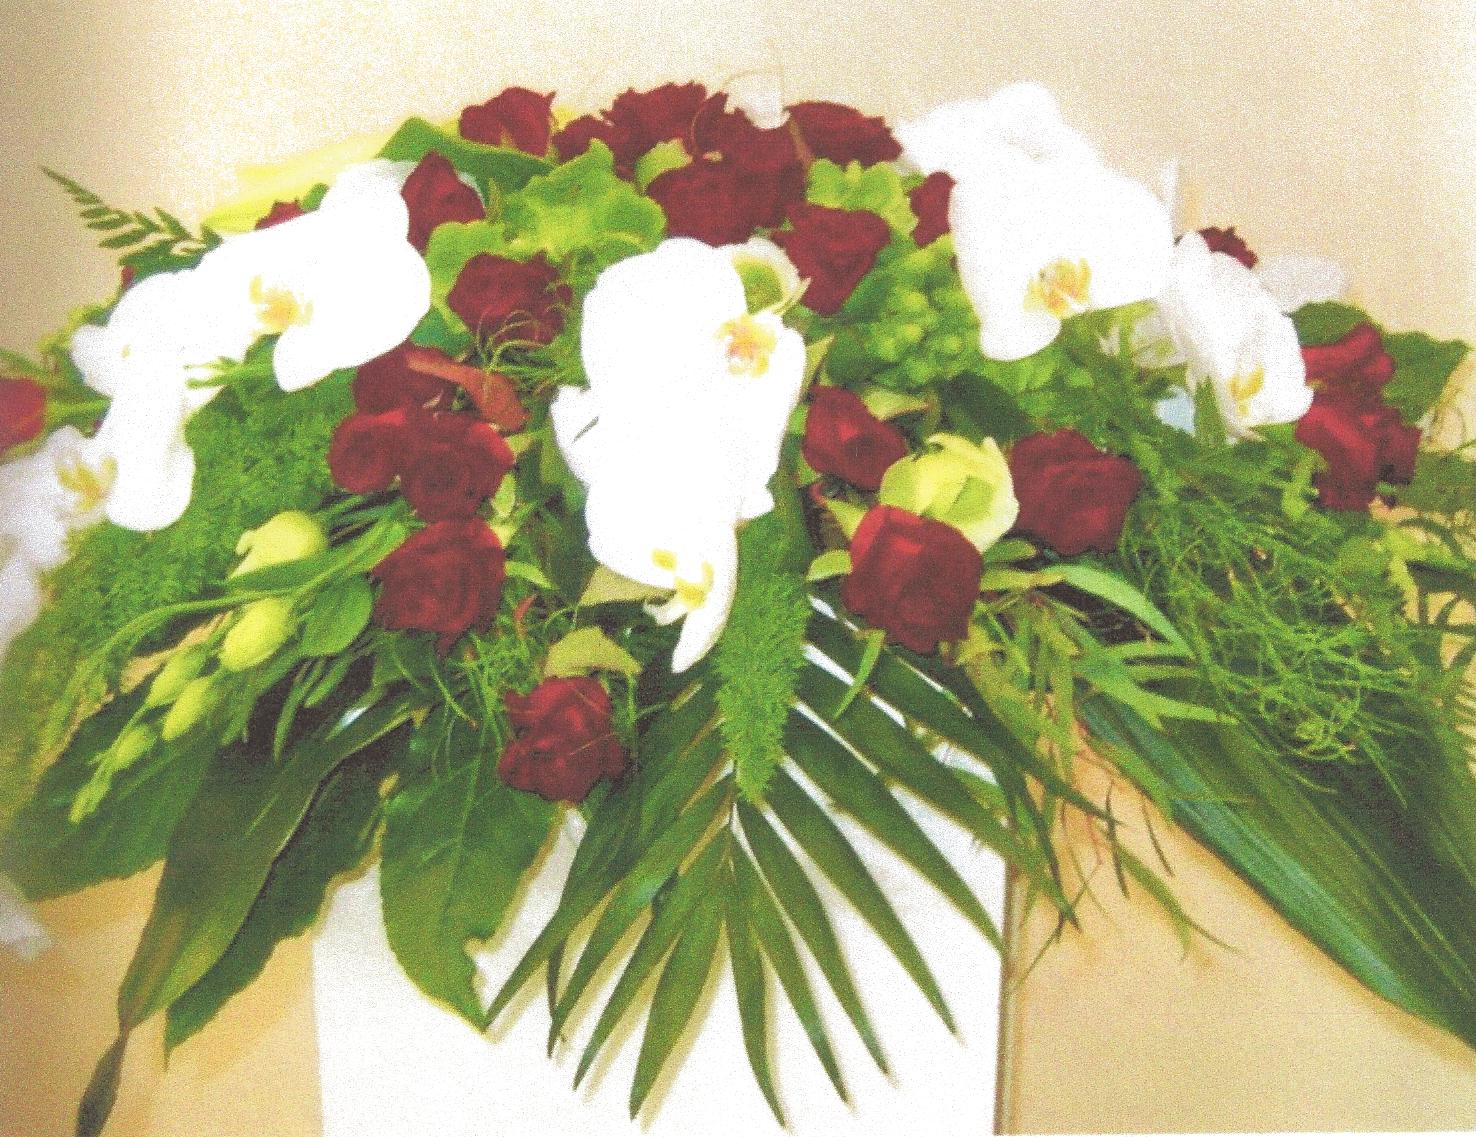 NR 18 bloemstuk en of kiststuk 140 euro